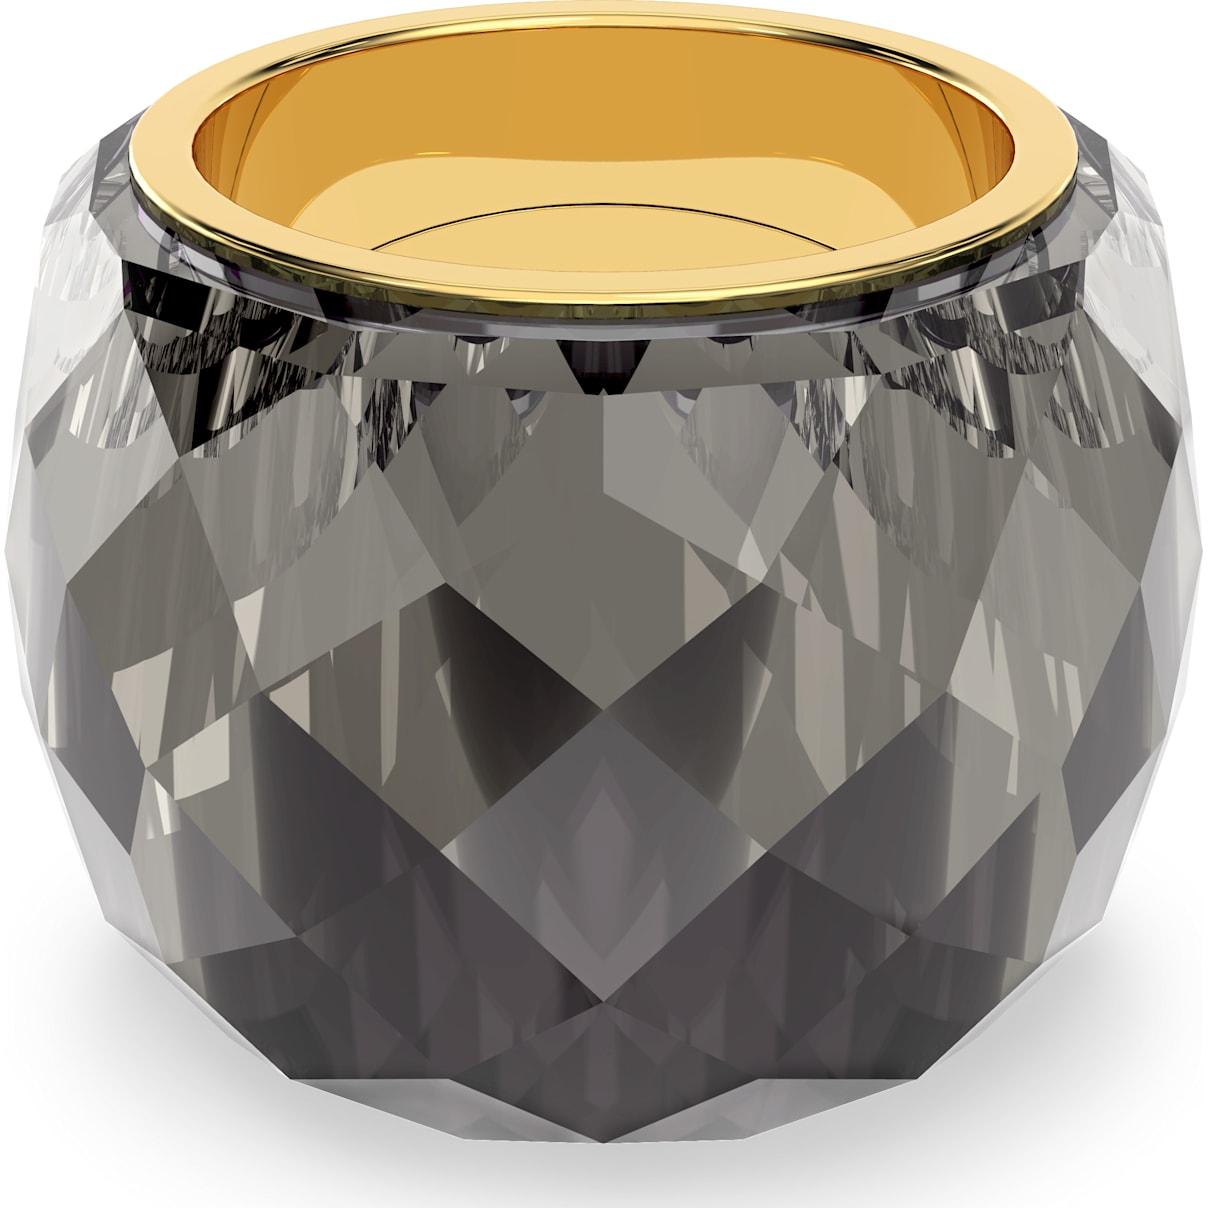 Swarovski Swarovski Nirvana Ring, Gray, Gold-tone PVD